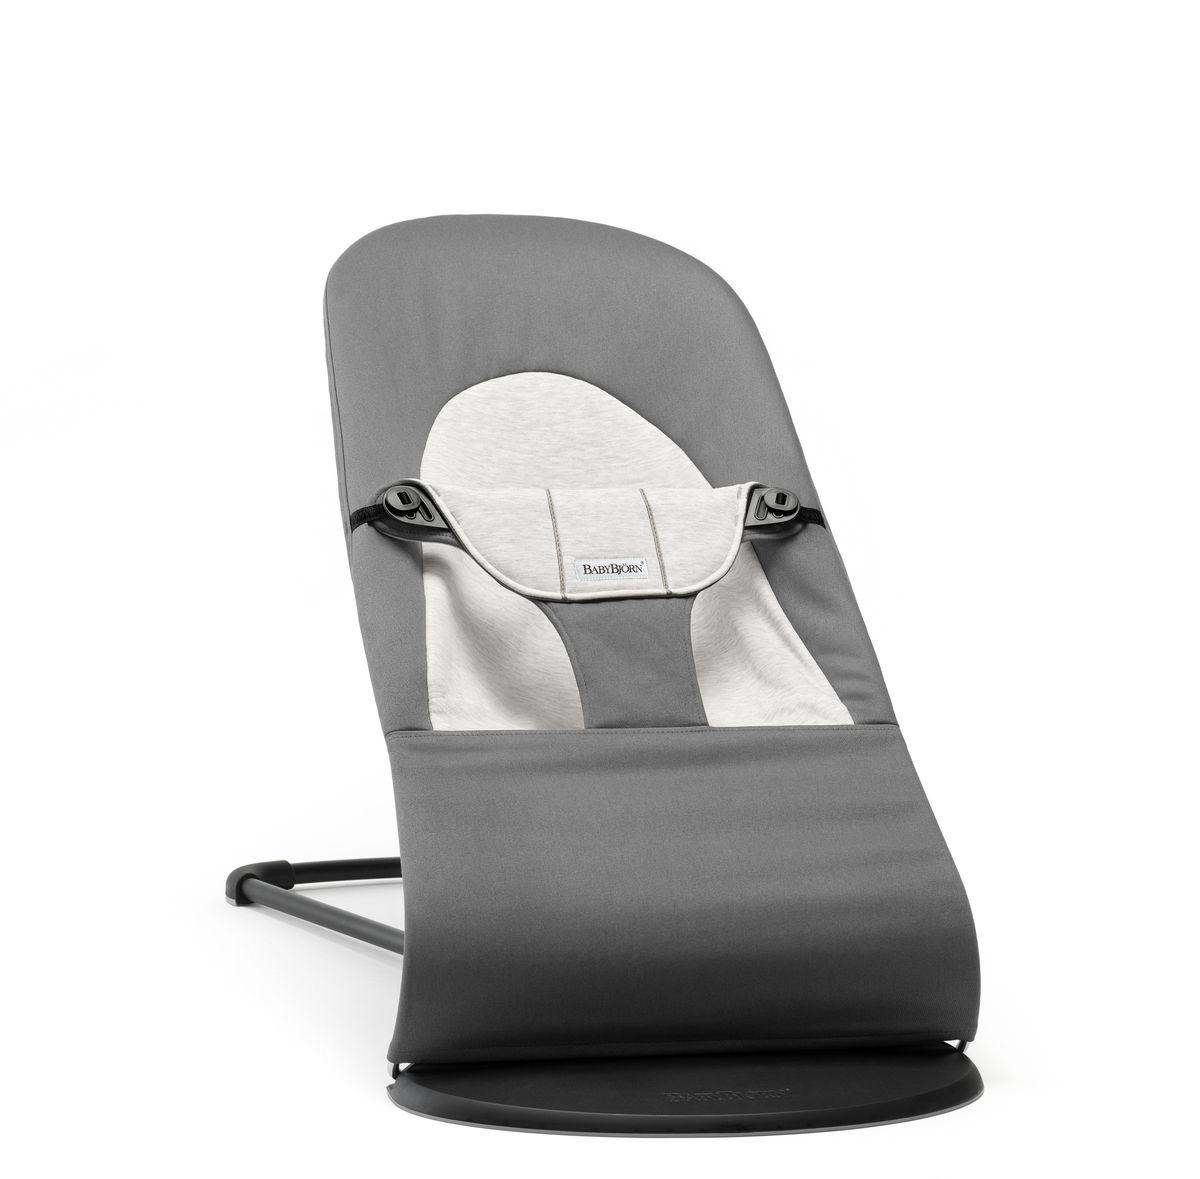 BabyBjorn Кресло-шезлонг Balance Jersey, цвет: темно-серый, серый кресла качалки шезлонги babybjorn кресло шезлонг bliss mesh